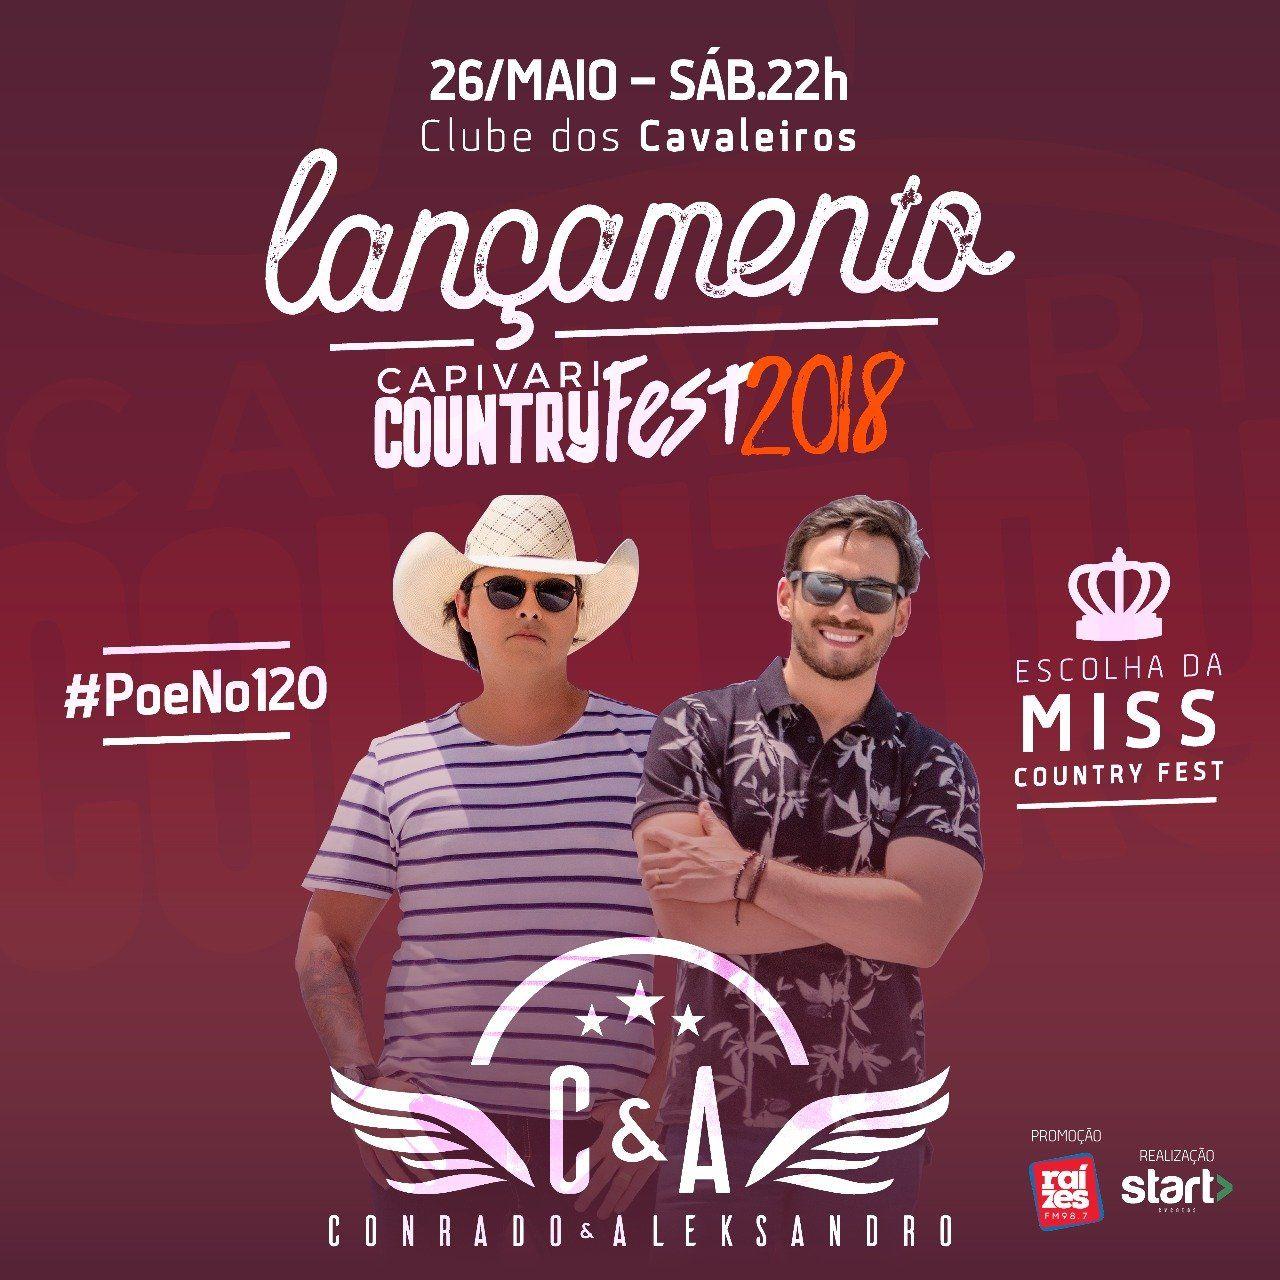 Conrado & Aleksandro - 26/05/18 - Capivari - SP